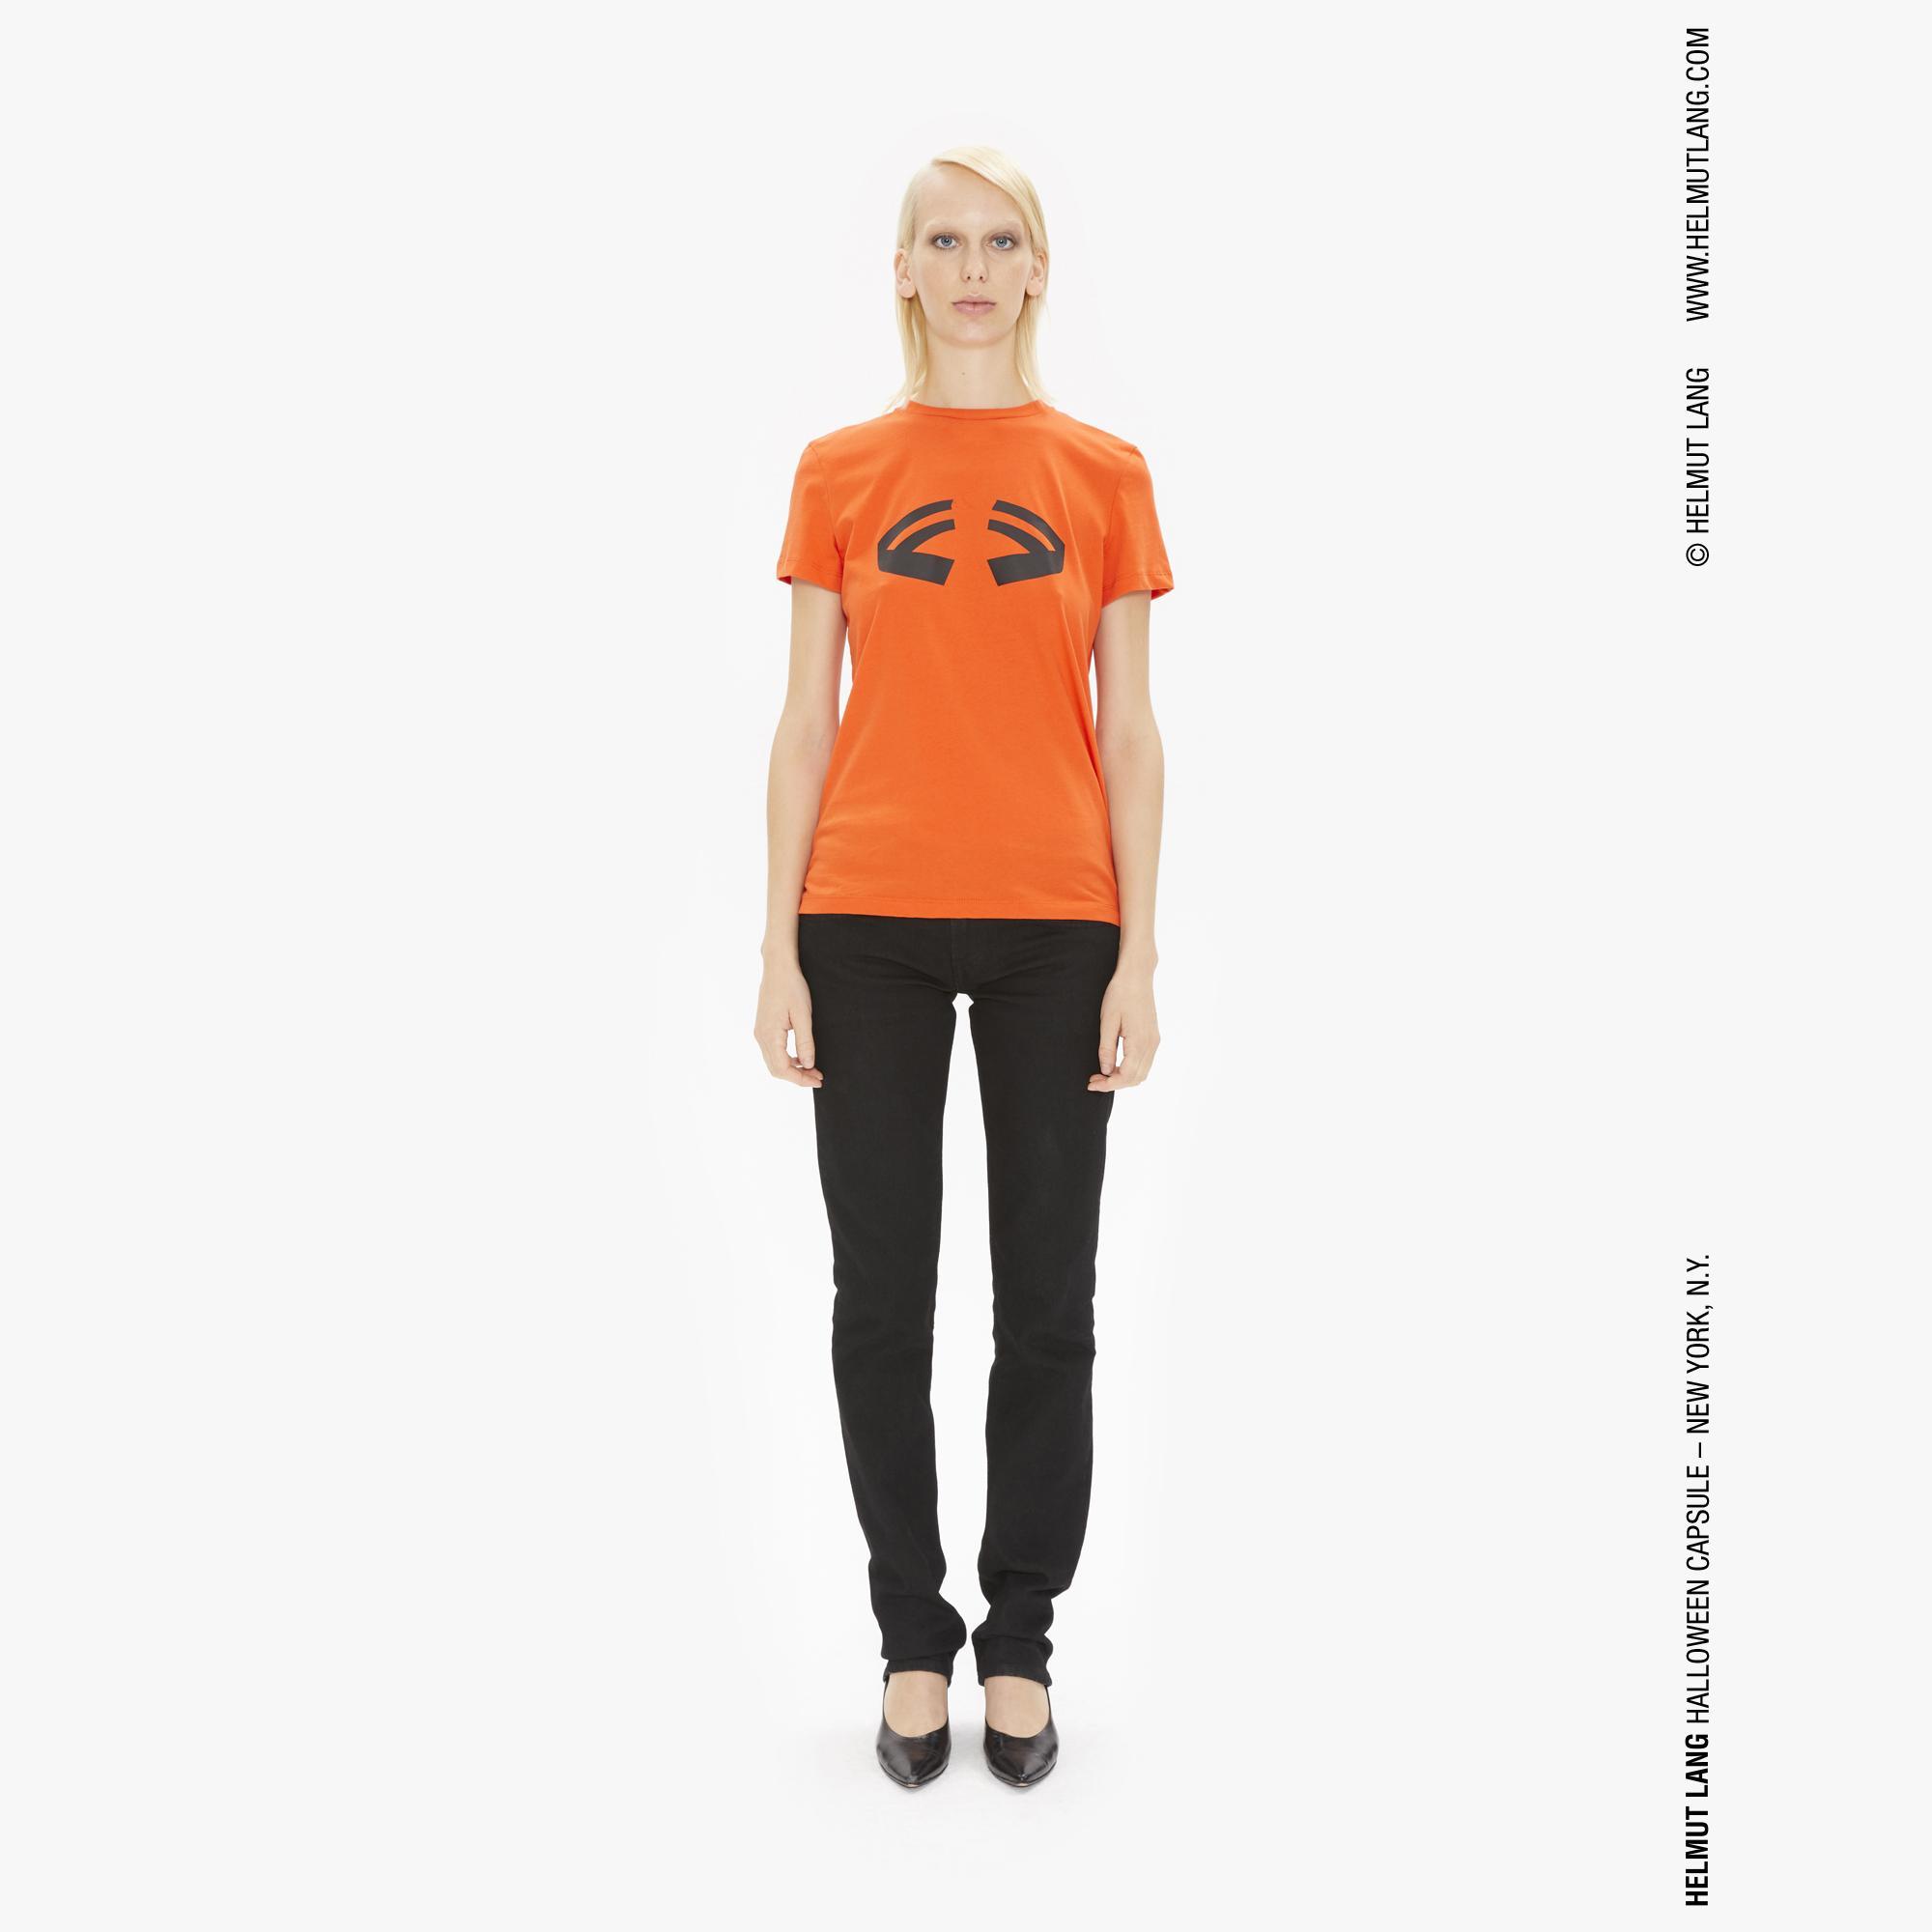 Helmut Lang Womens Printed Halloween T Shirt In Pumpkin Orange